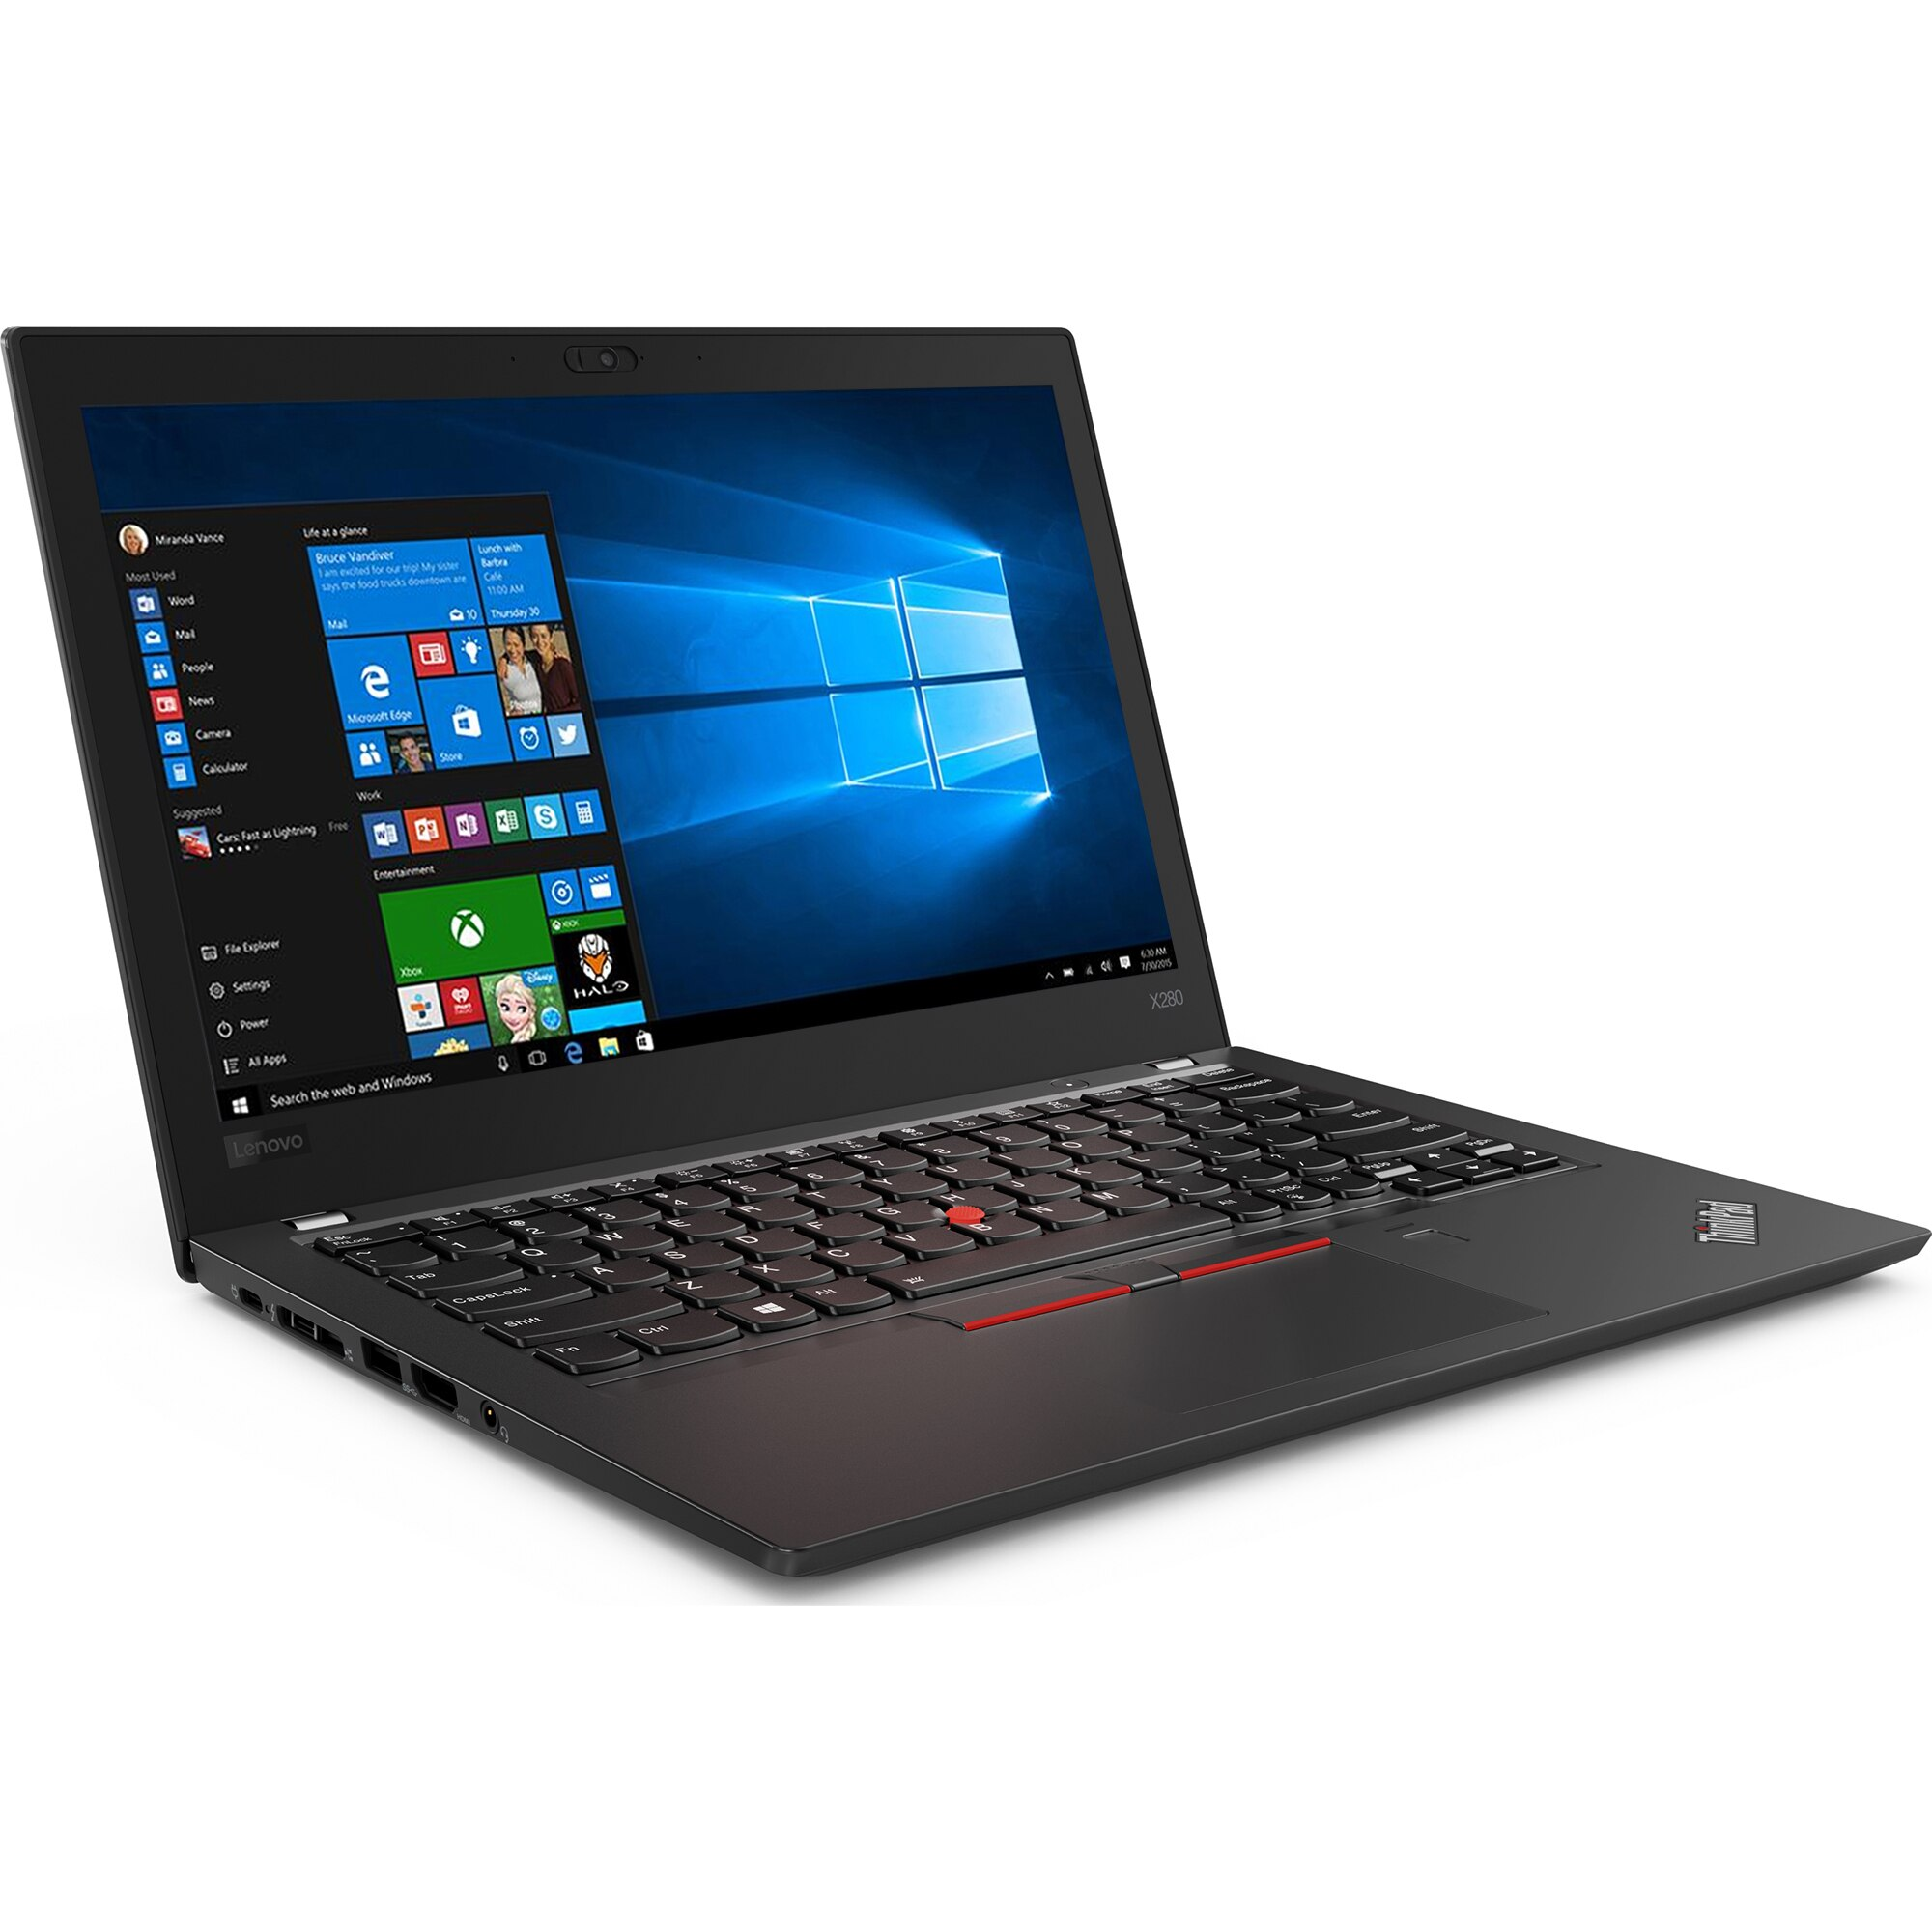 "Laptop Lenovo ThinkPad x280, Intel Core i5 8350U 1.7 GHz, 8 GB DDR4, 256 GB M.2 NVMe, Intel UHD Graphics 620, WI-FI, Bluetooth, WebCam, Display 12.5"" 1920 by 1080, TouchScreen, Windows 10 Pro, 3 Ani Garantie - imaginea 2"